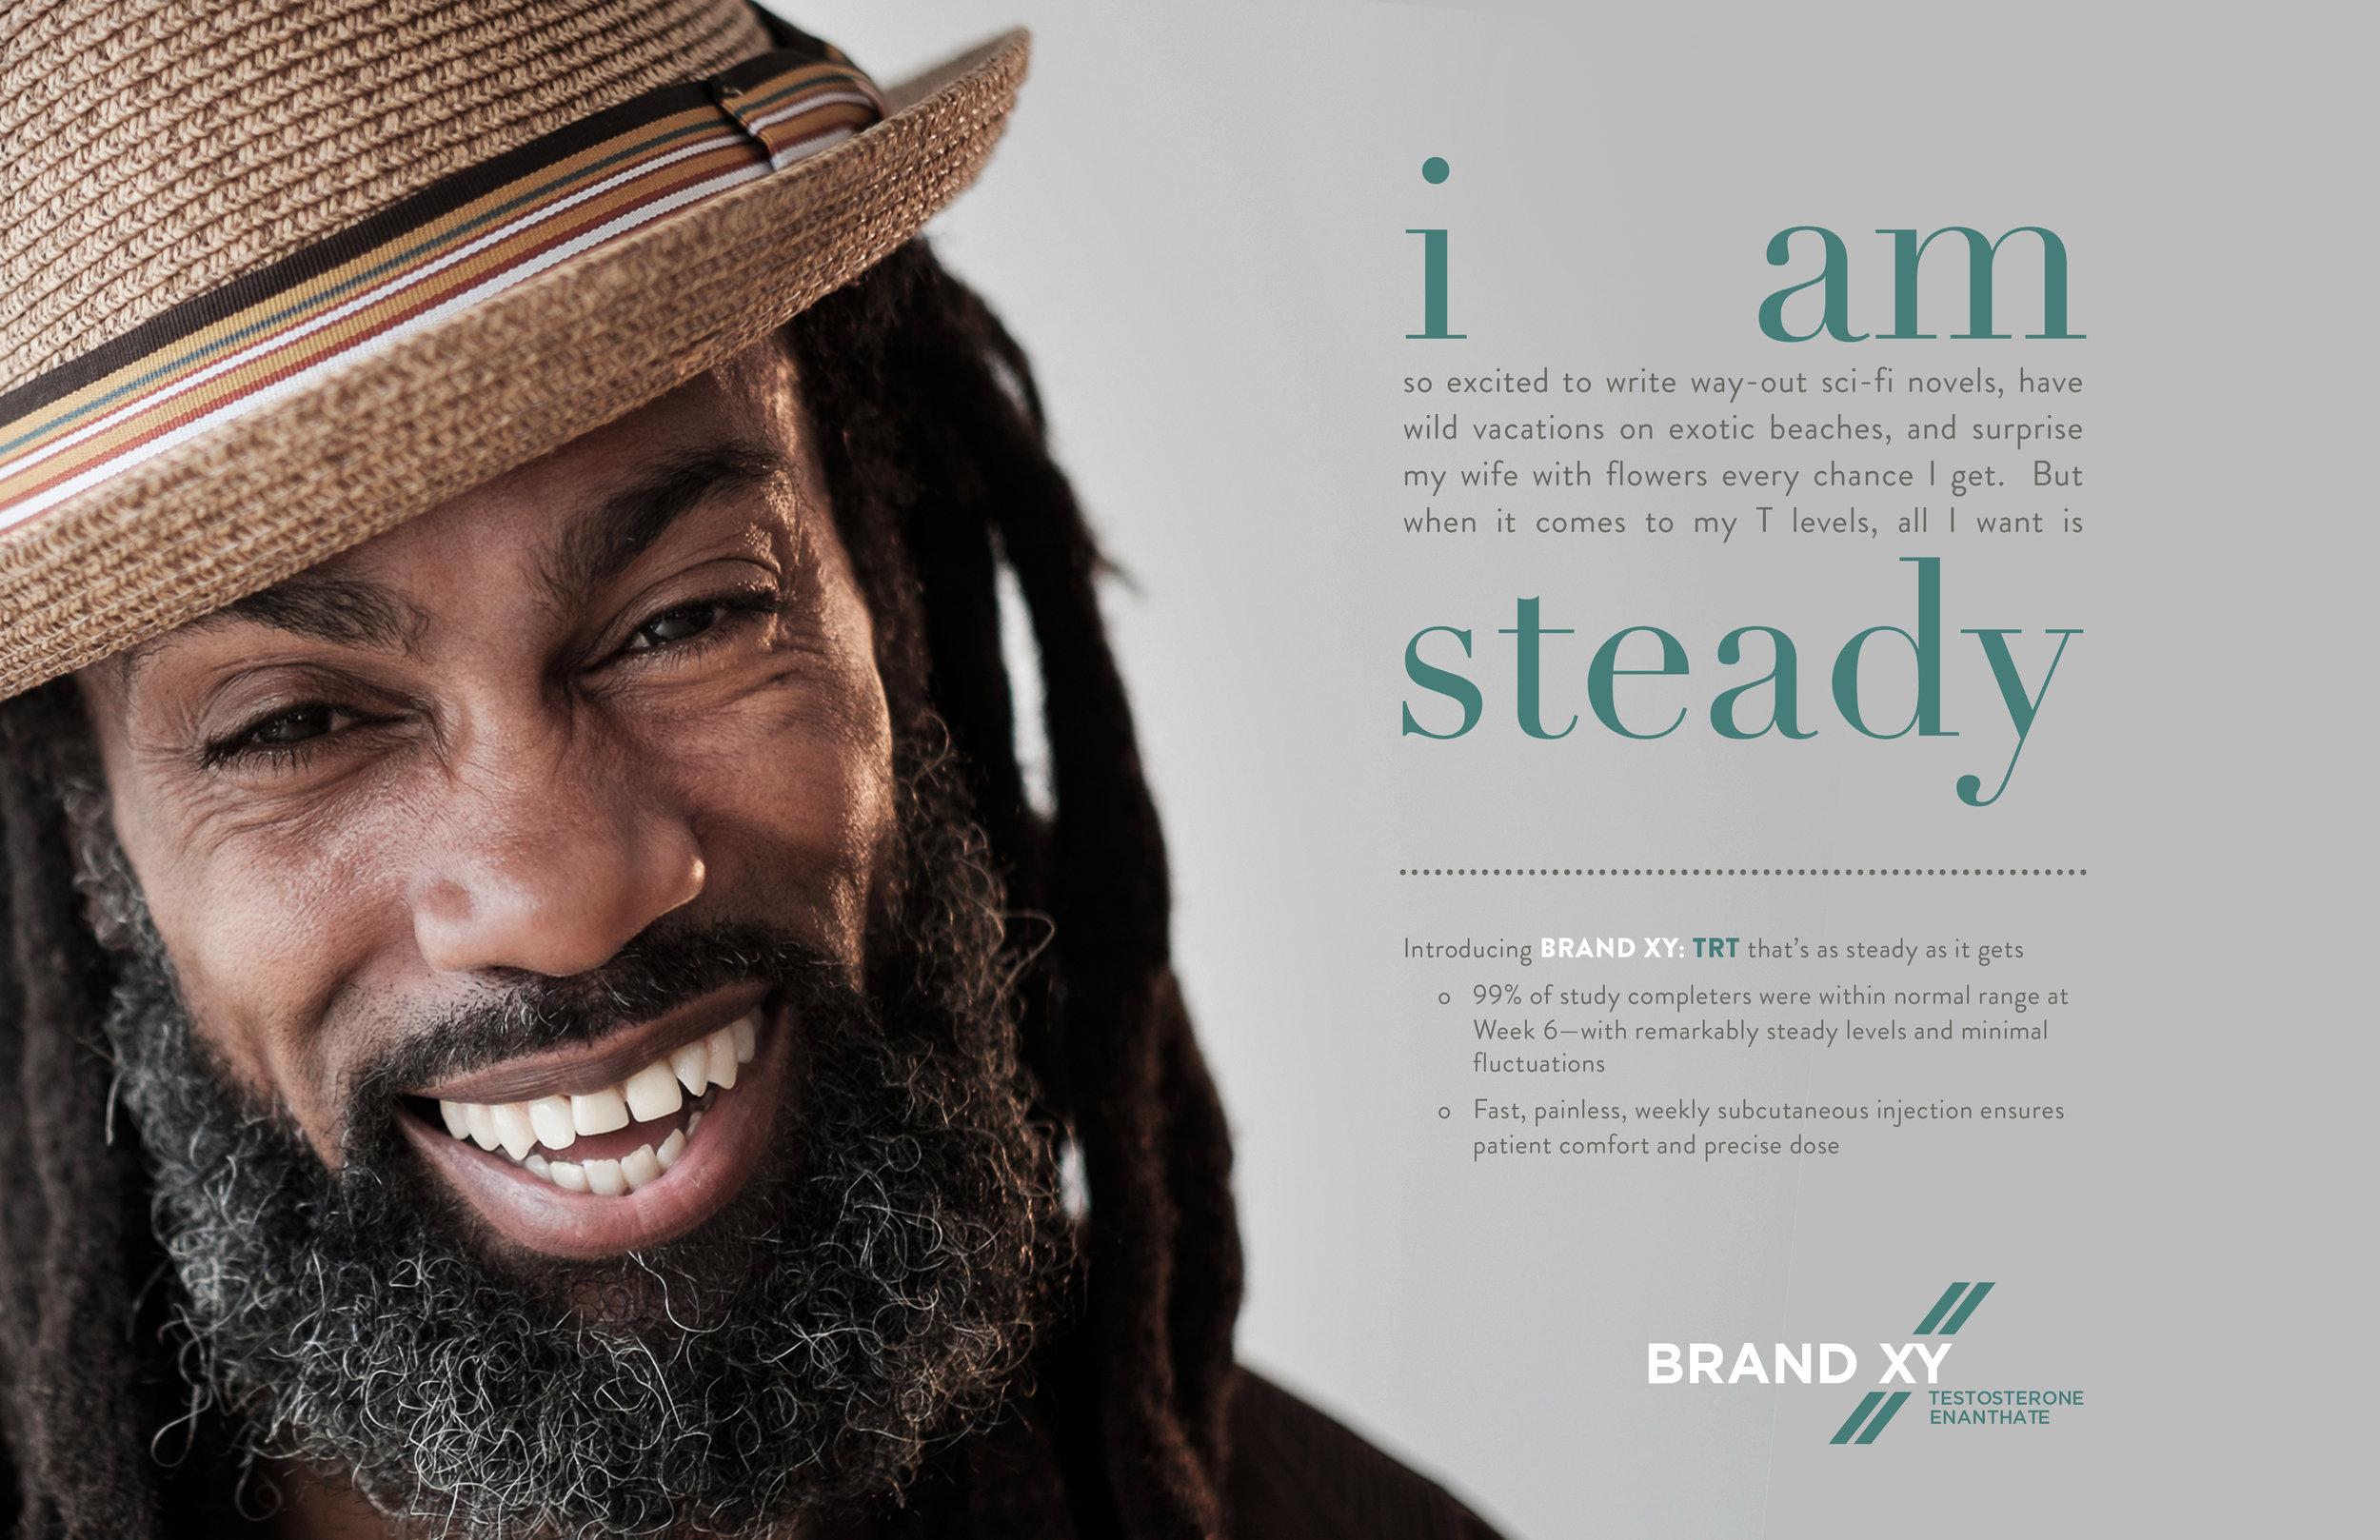 Steady Ads 23.jpg